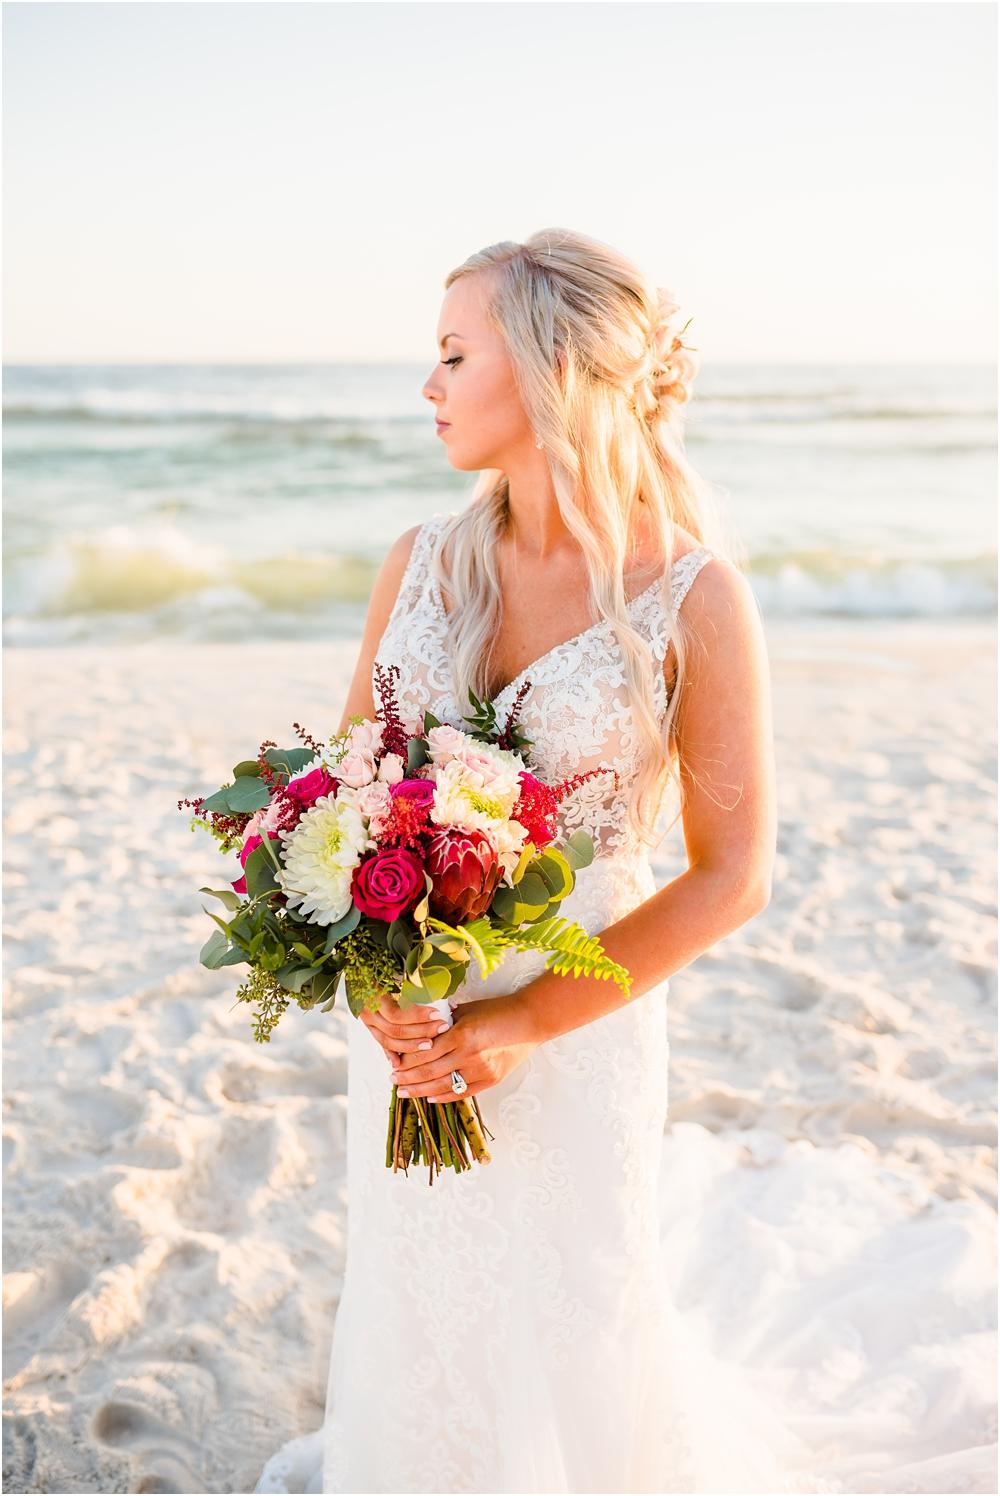 mcglothlin-wedding-kiersten-stevenson-photography-30a-panama-city-beach-dothan-tallahassee-(98-of-145).jpg